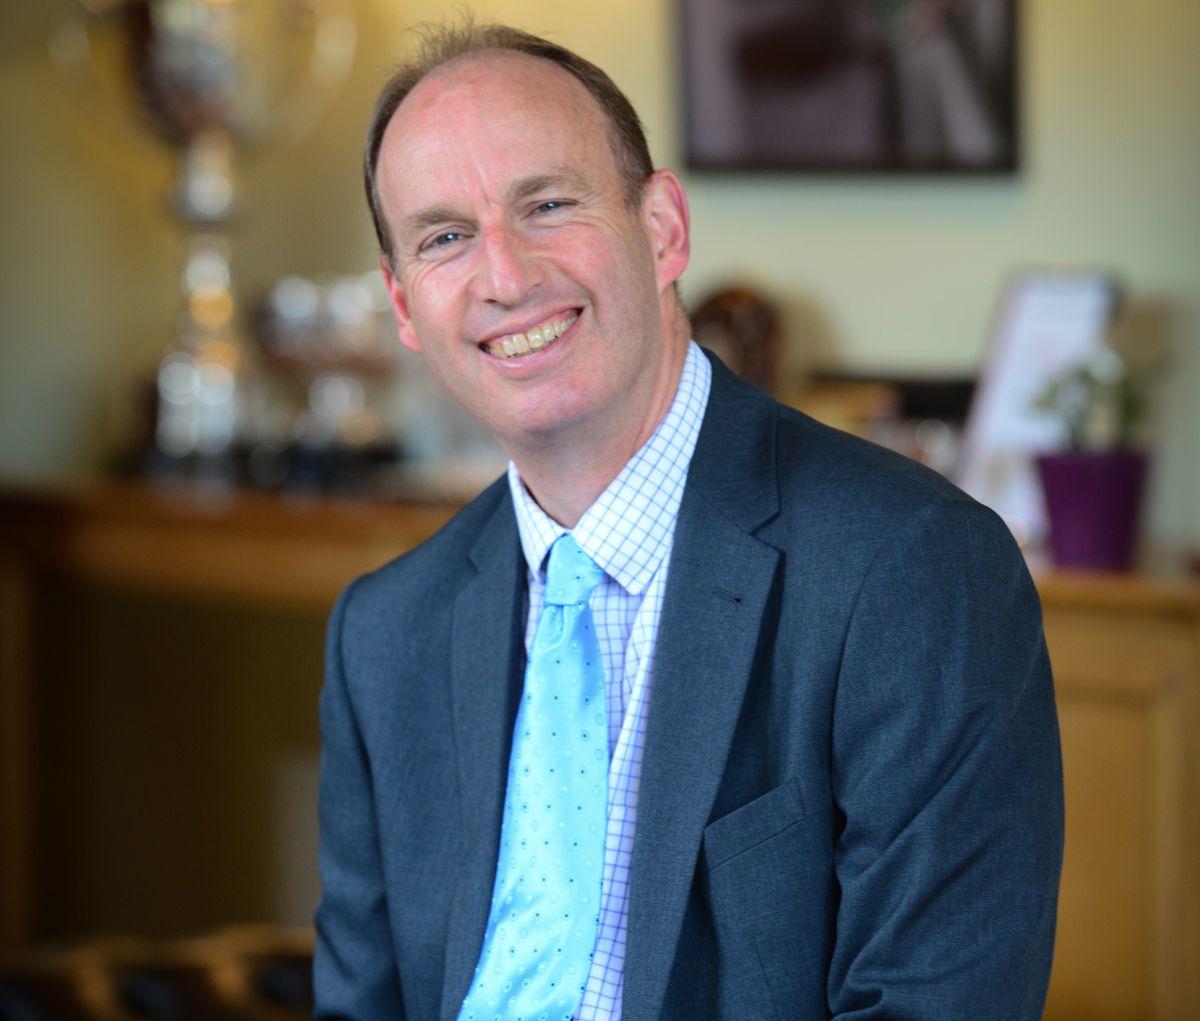 Wrekin College headteacher Tim Firth